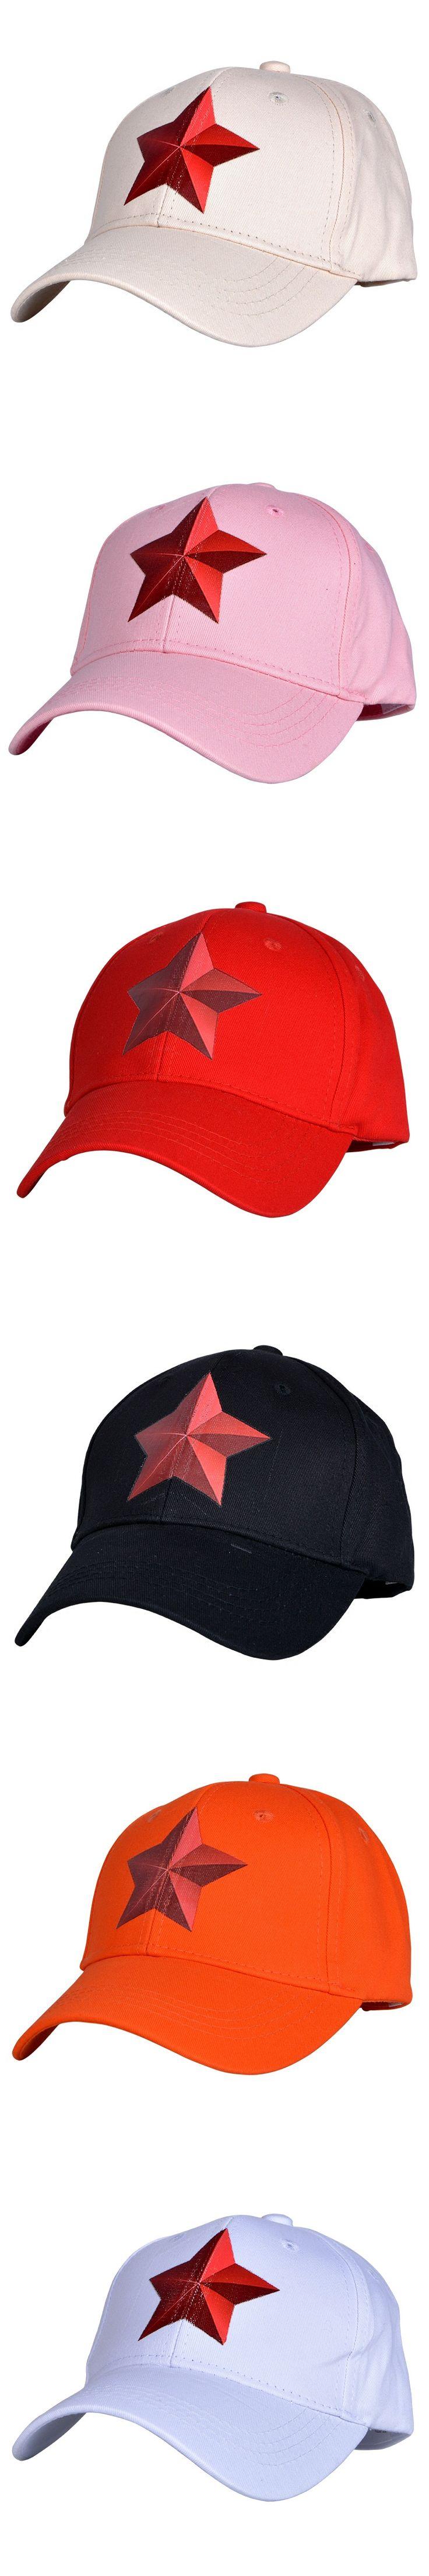 Kids' Pentagram Baseball Caps 3-8years old Red star Hip hop Caps Snapback hats children Baby Boys Girls hat Sun hat